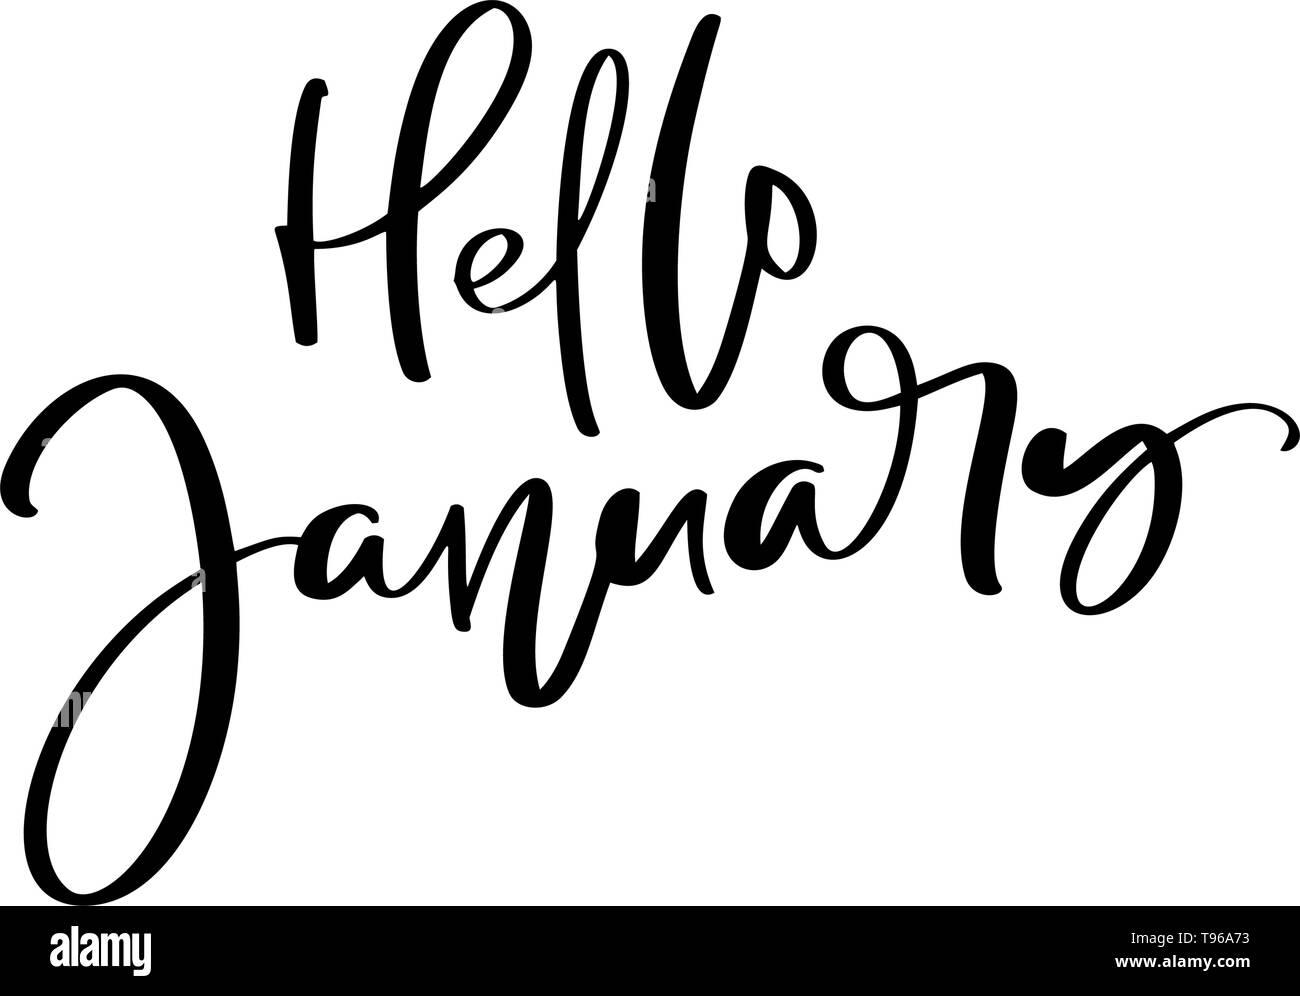 Hola Dibujados A Mano Frase Letras De Enero Pincel De Tinta